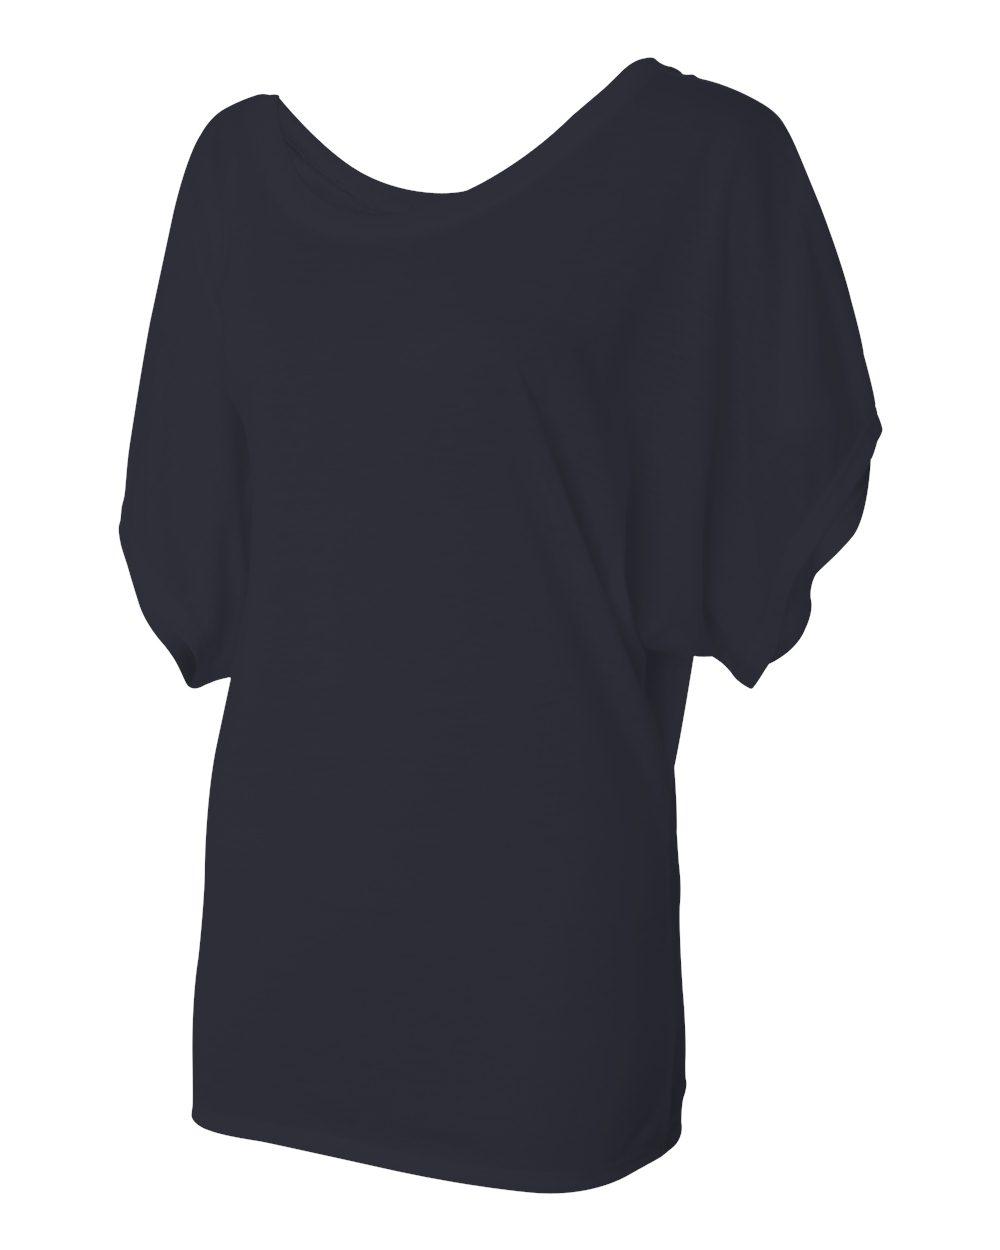 Bella-Canvas-Women-039-s-Flowy-Draped-Sleeve-Dolman-T-Shirt-8821-S-2XL thumbnail 24